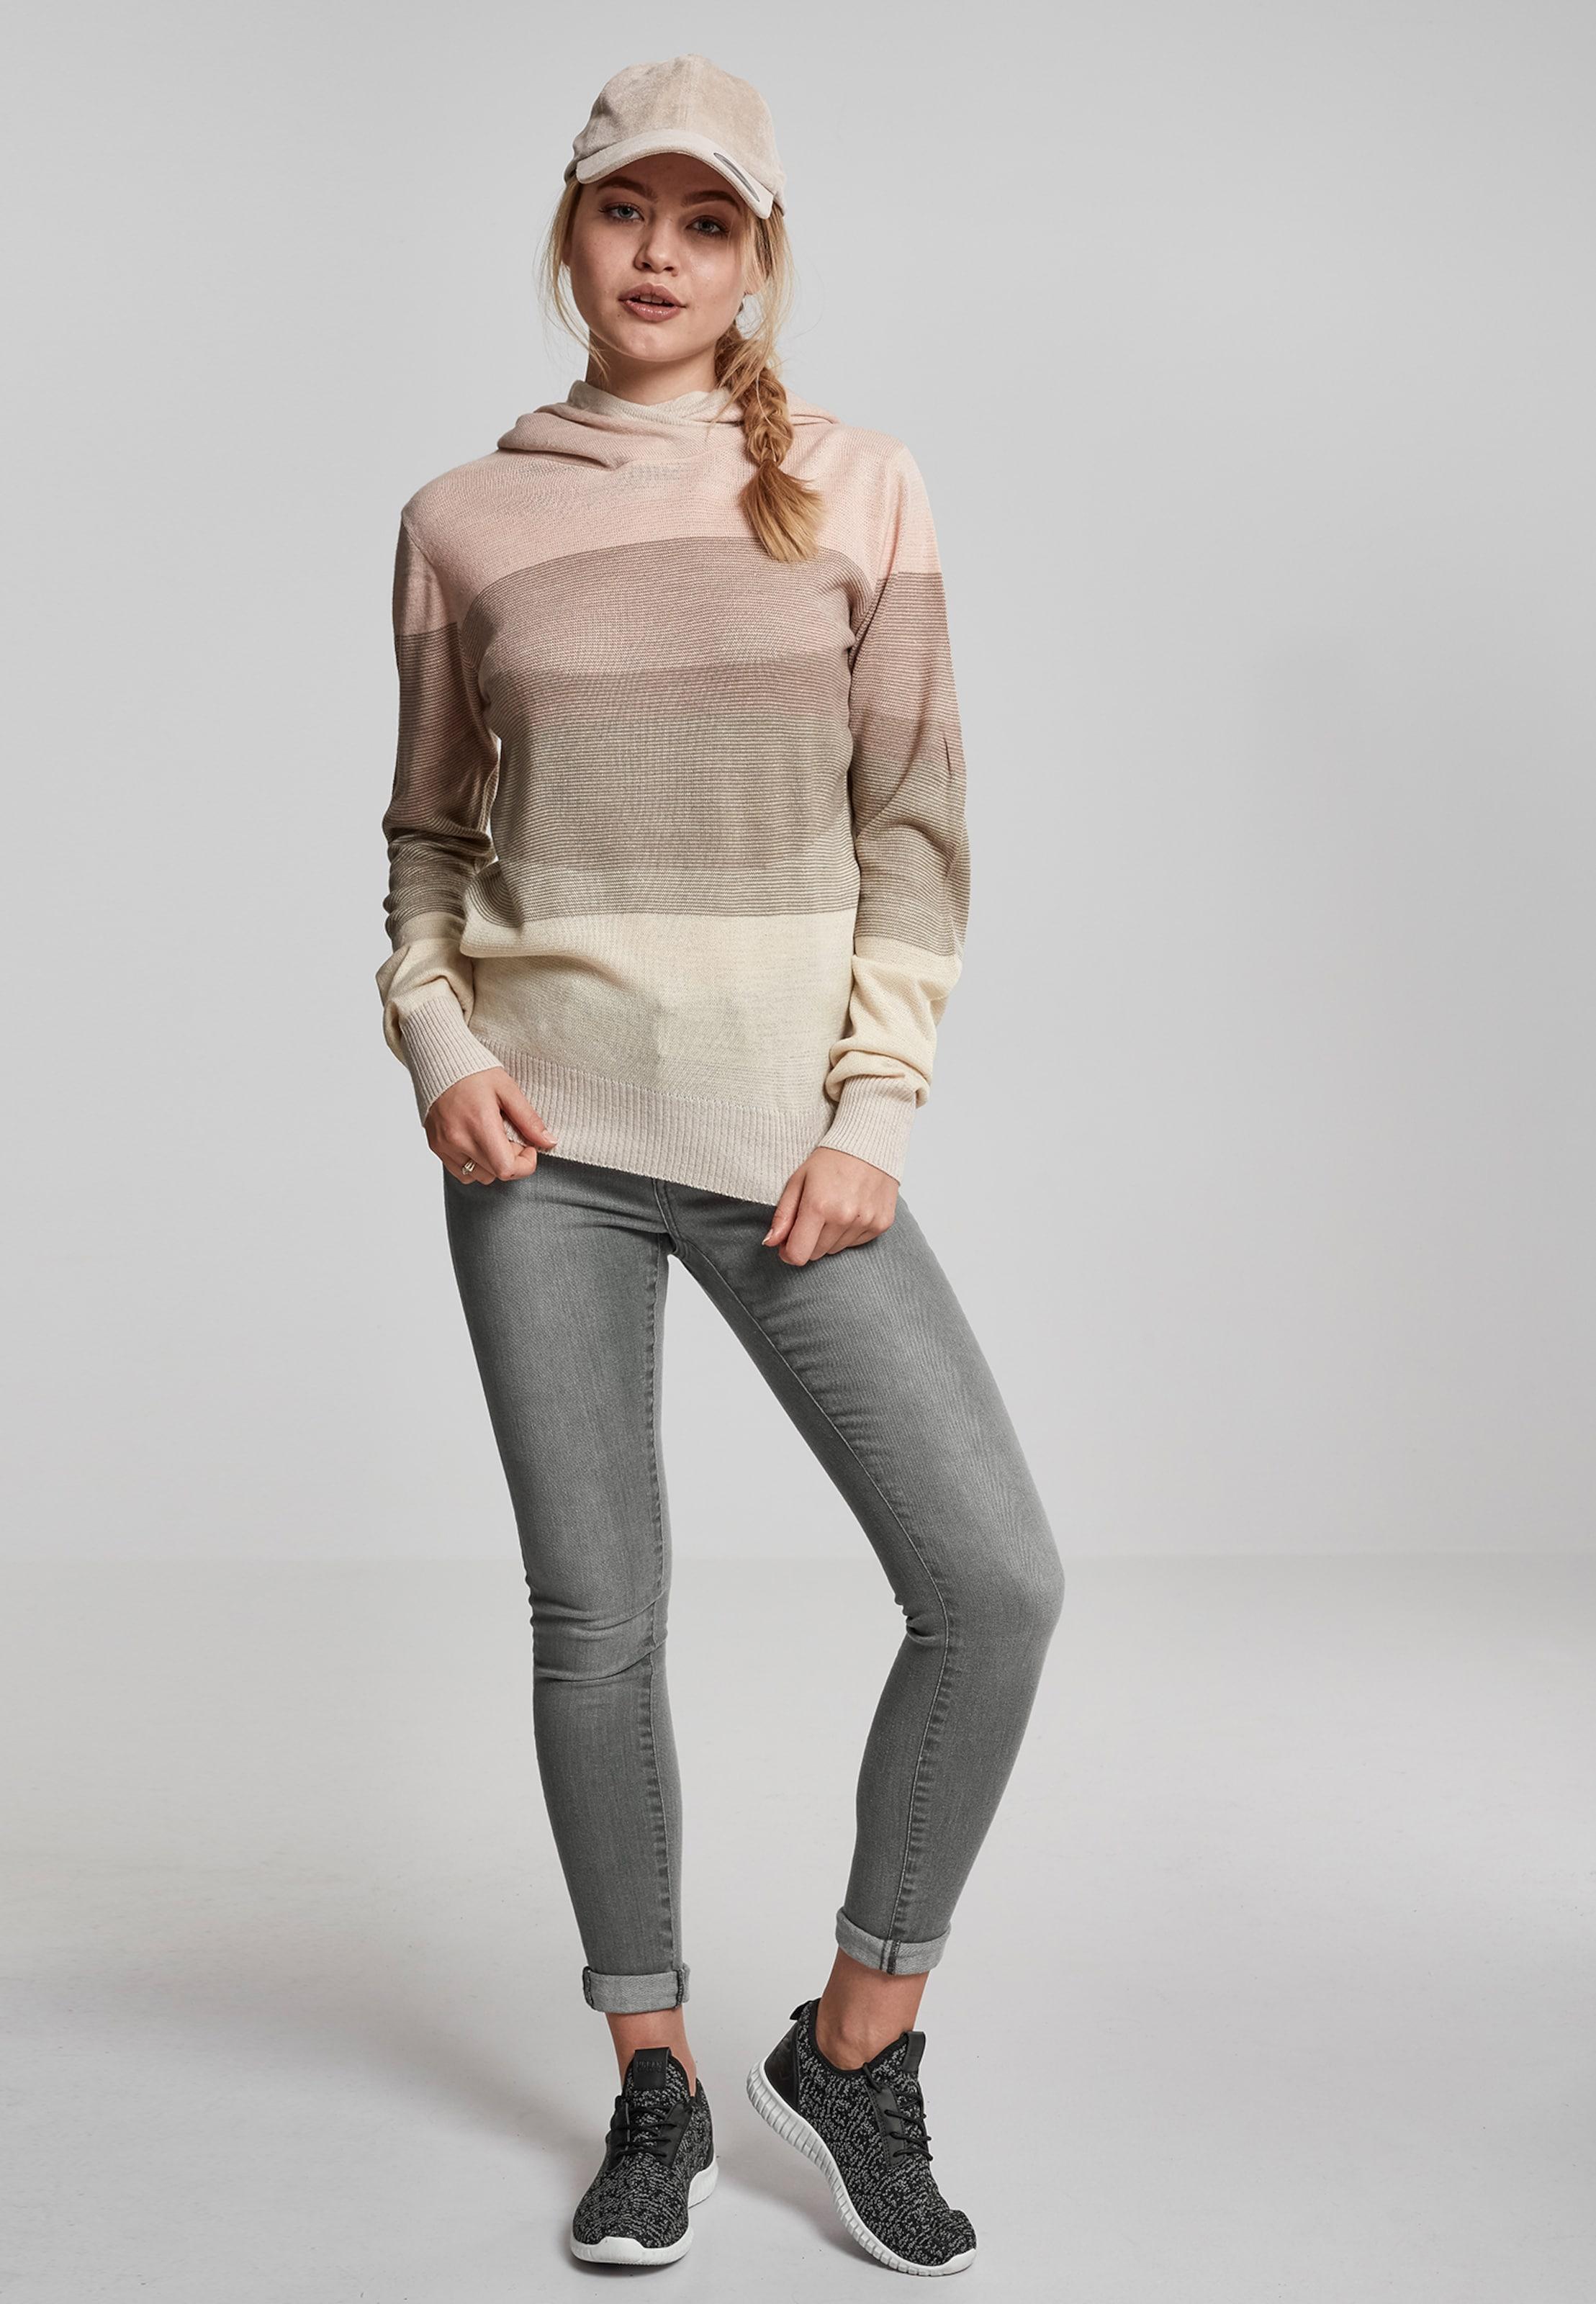 Classics HellbeigeDunkelbeige Urban In Rosa Sweatshirt D2IYEeW9H